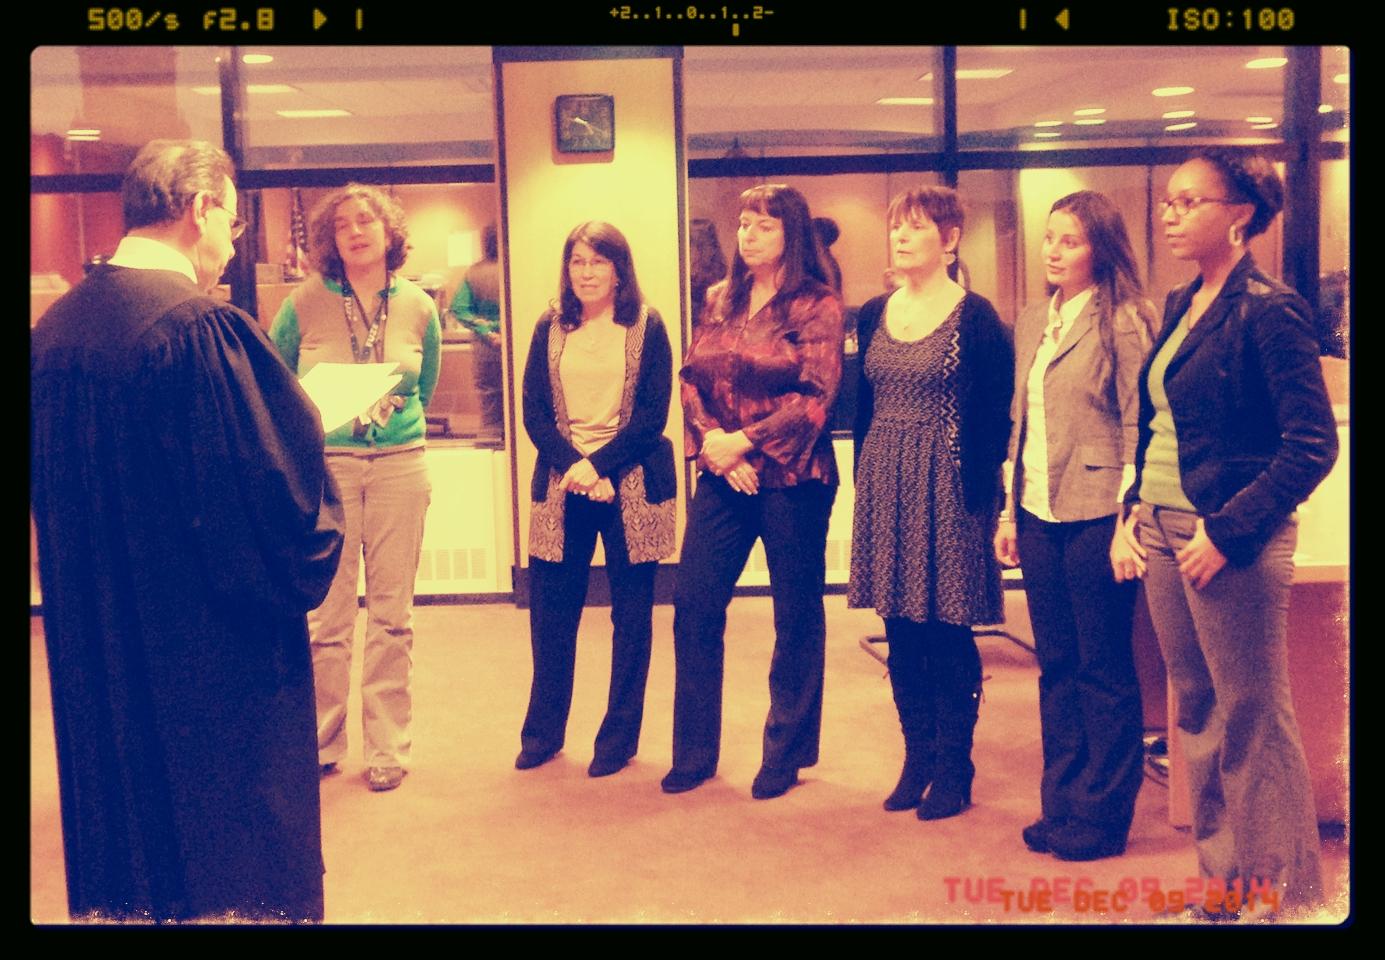 Judge Joseph A. Portelli administering the Oath of Office to (left to right) Naomi Gamorra, Mary Dykes, Denise Damiano, Jo-Ann Pinheiro, Sebahat Guven, and Sosha Stewart at the Passaic County Superior Courthouse.